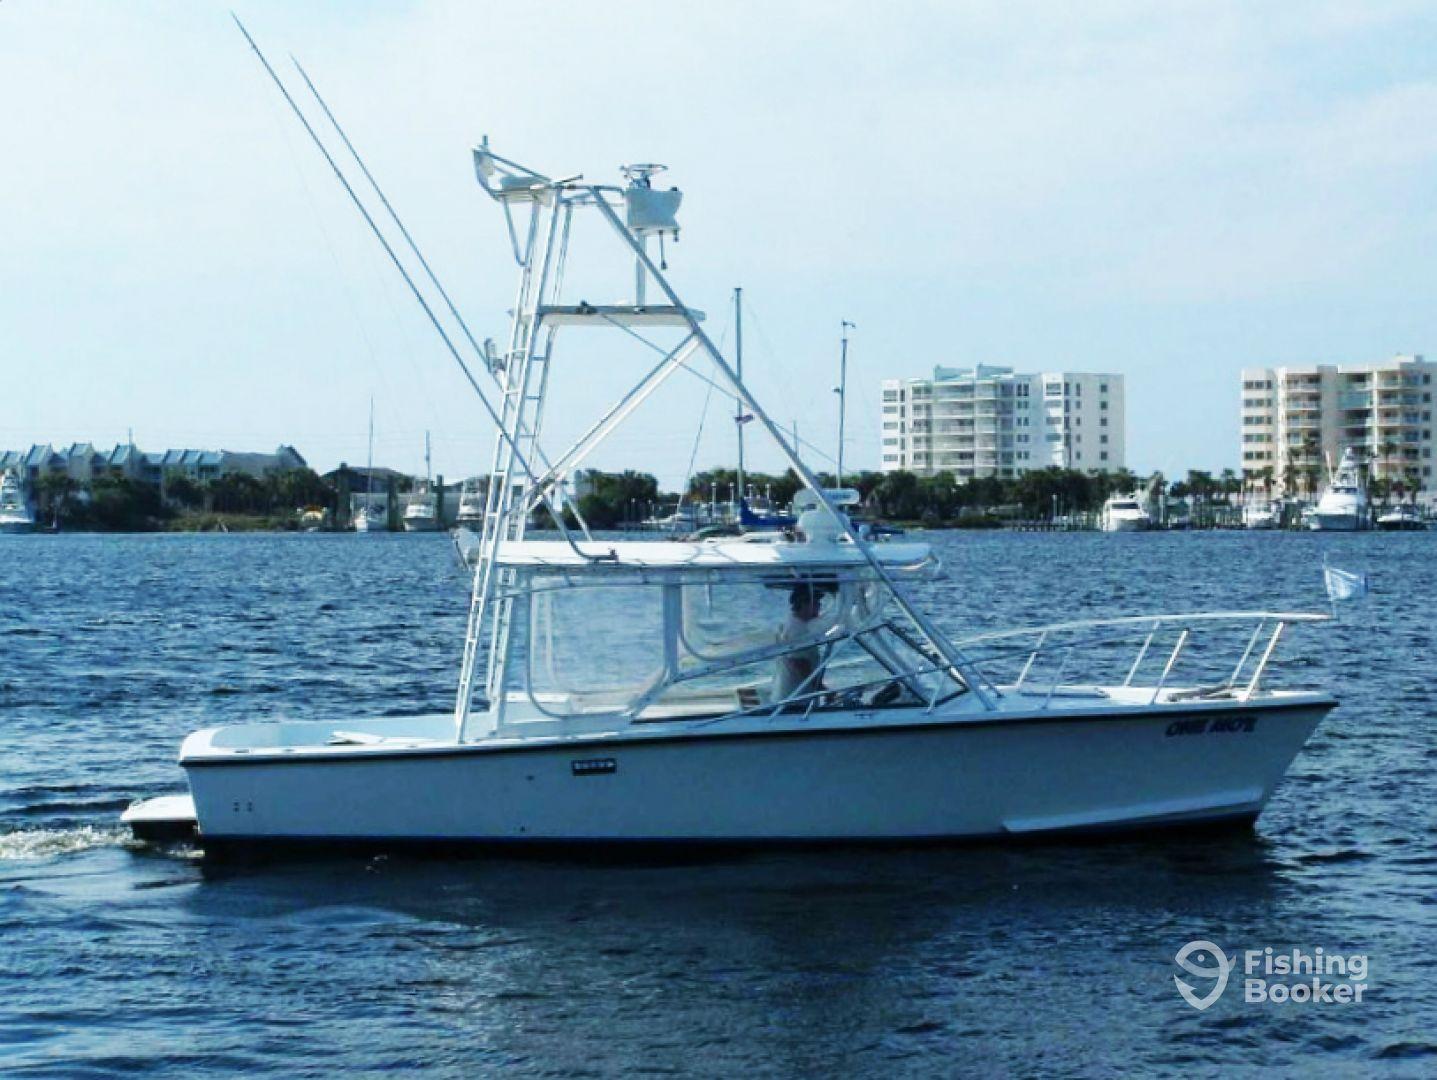 One mo r fishing charters destin fl fishingbooker for Destin florida fishing trips